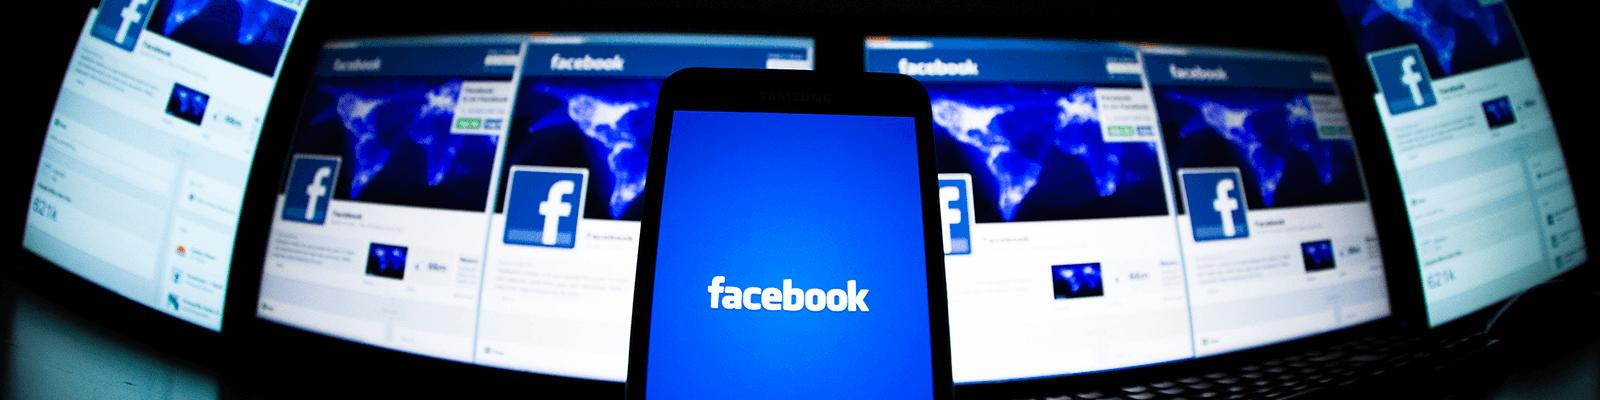 app development cost like facebook